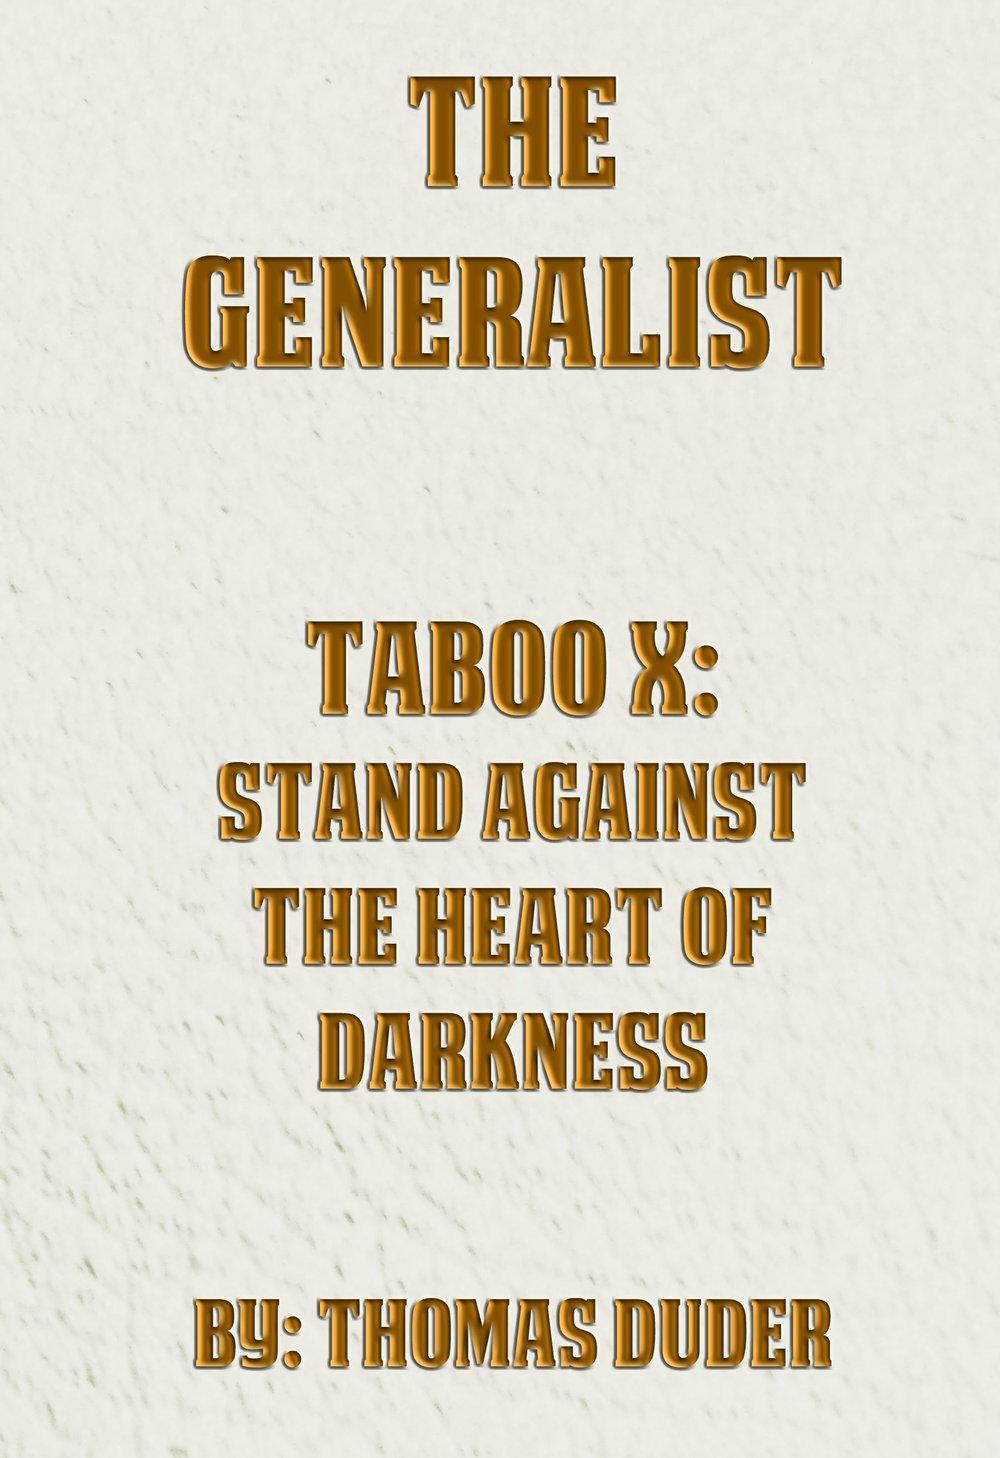 Heart of Darkness.jpg